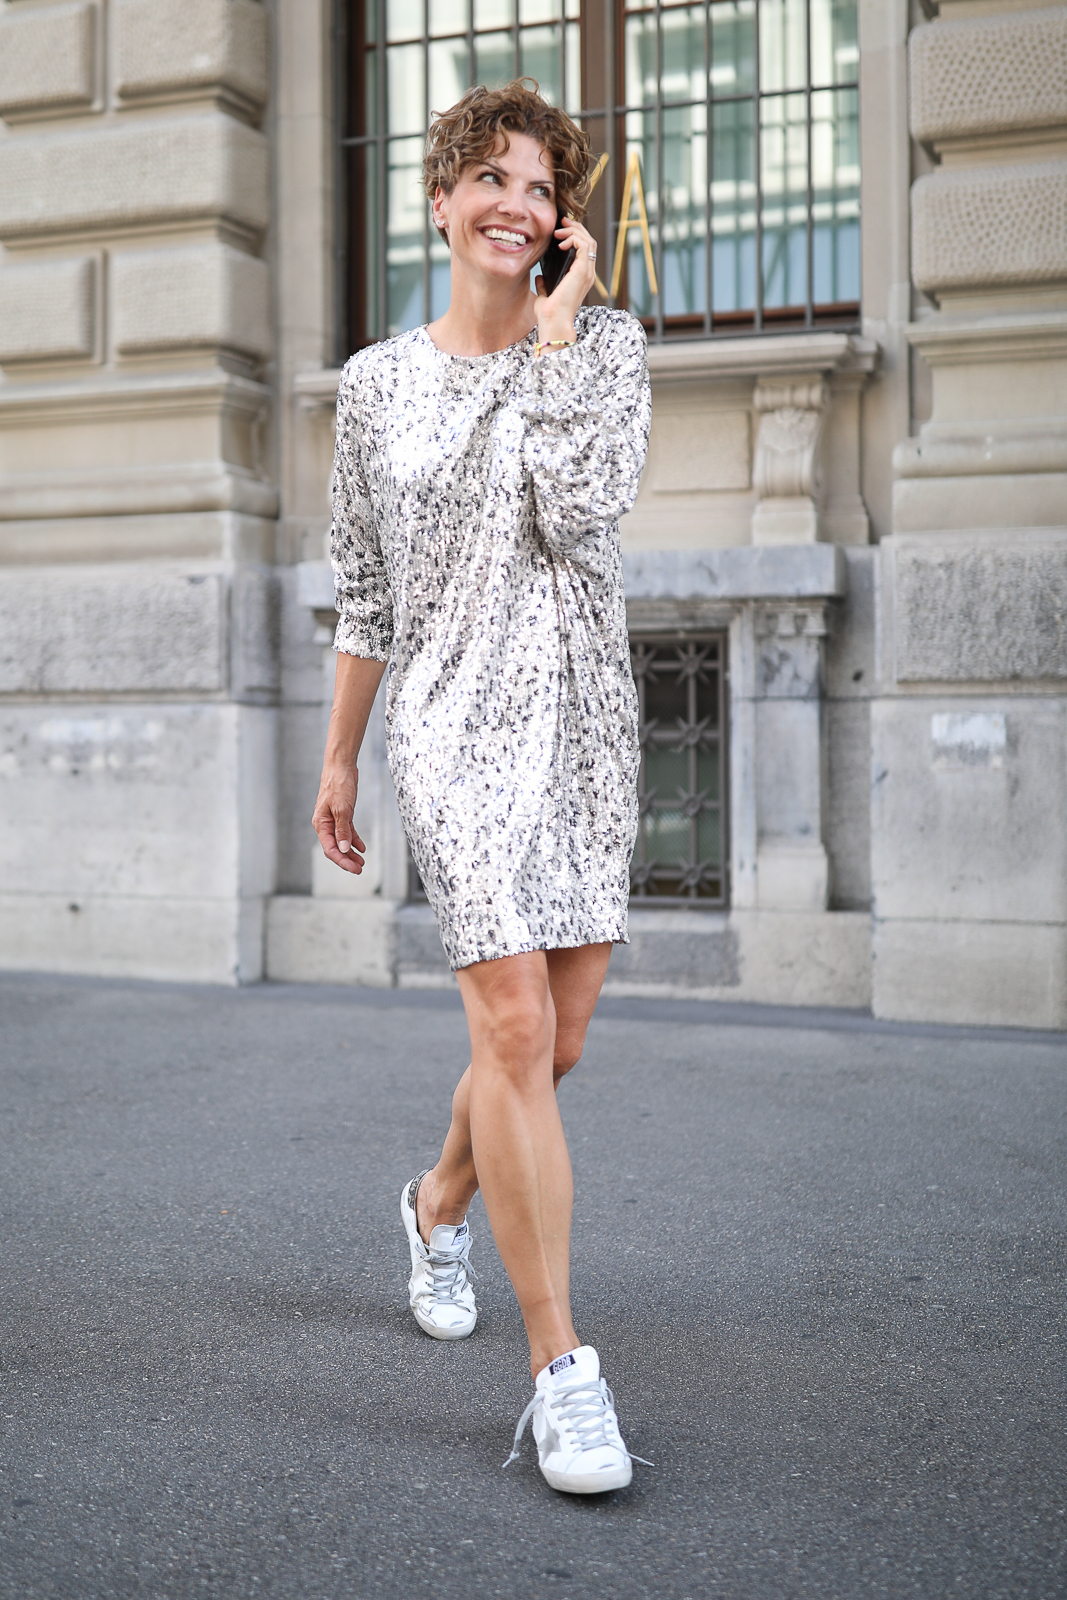 Daily Outfits, ITMFL, Golden Goose, Vestibule, Zurich